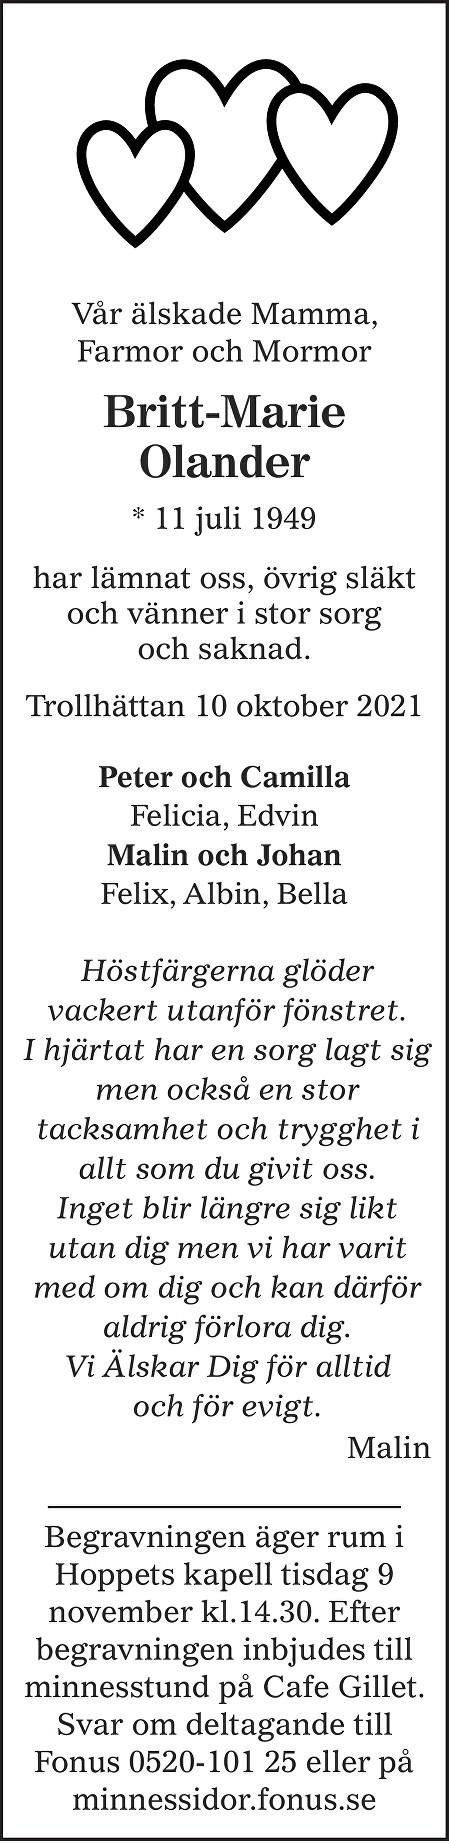 Britt-Marie Olander Death notice